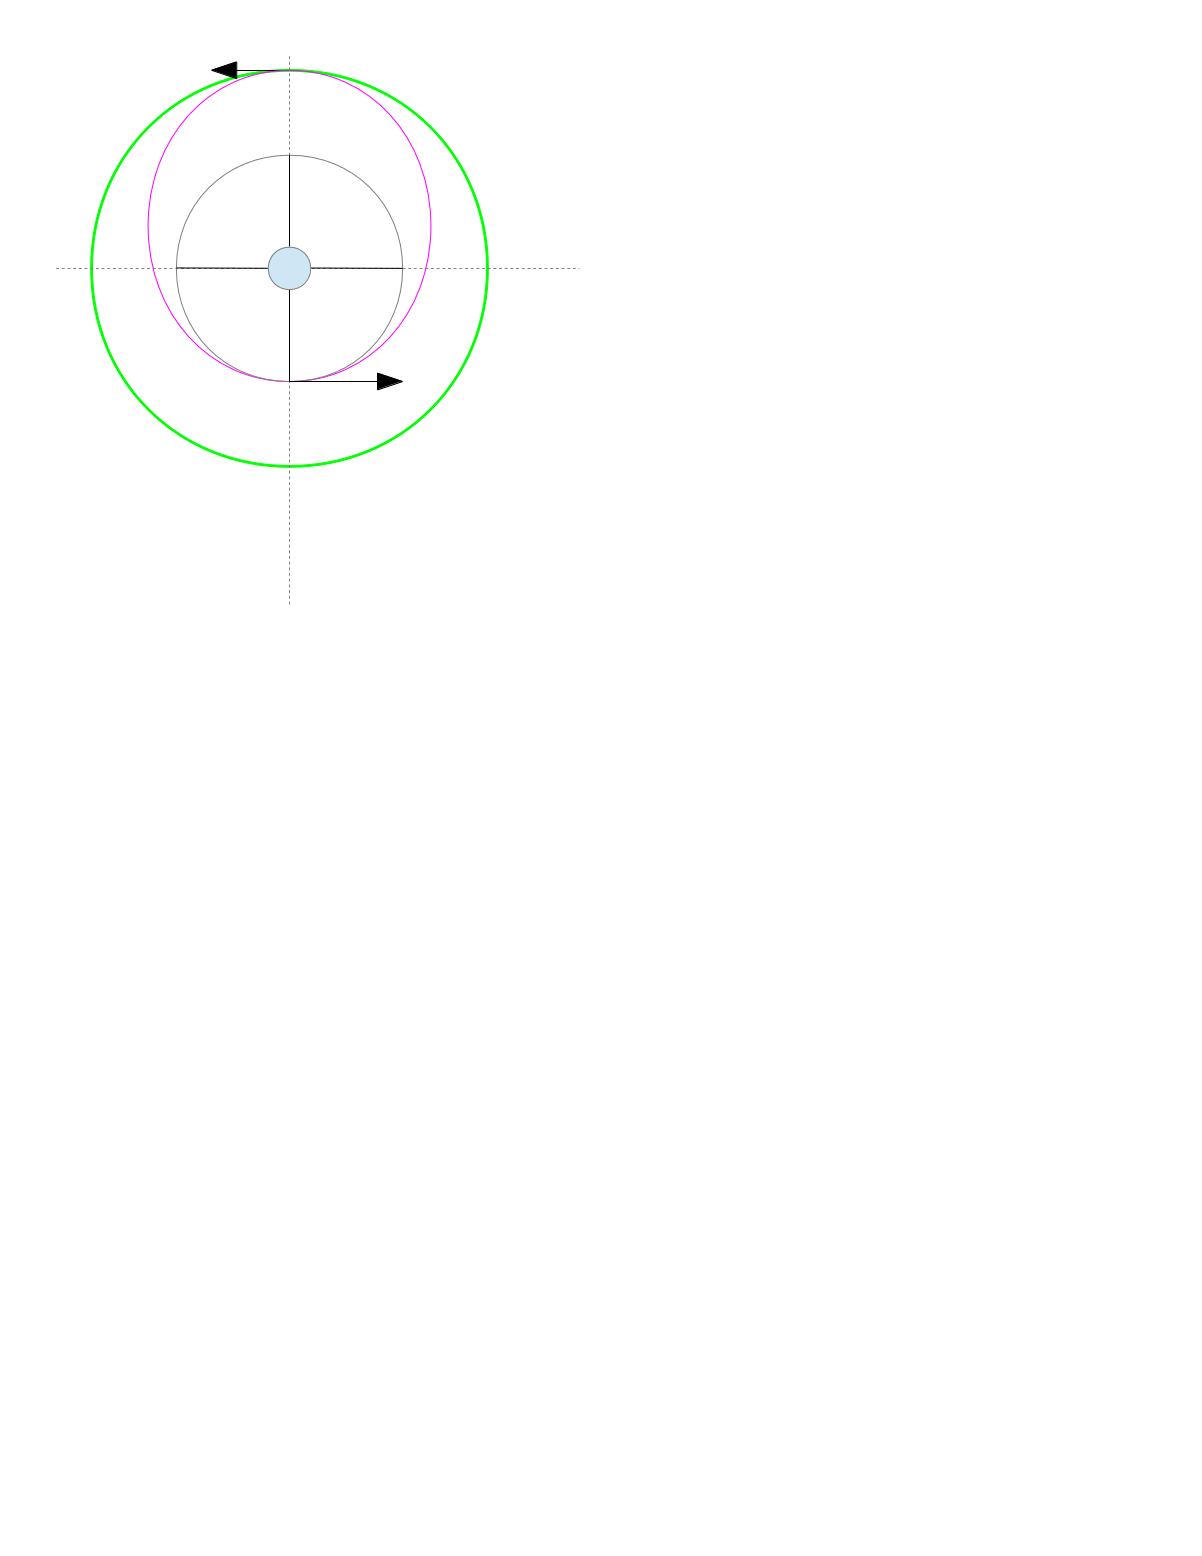 Huhmann_transfer_orbit.png